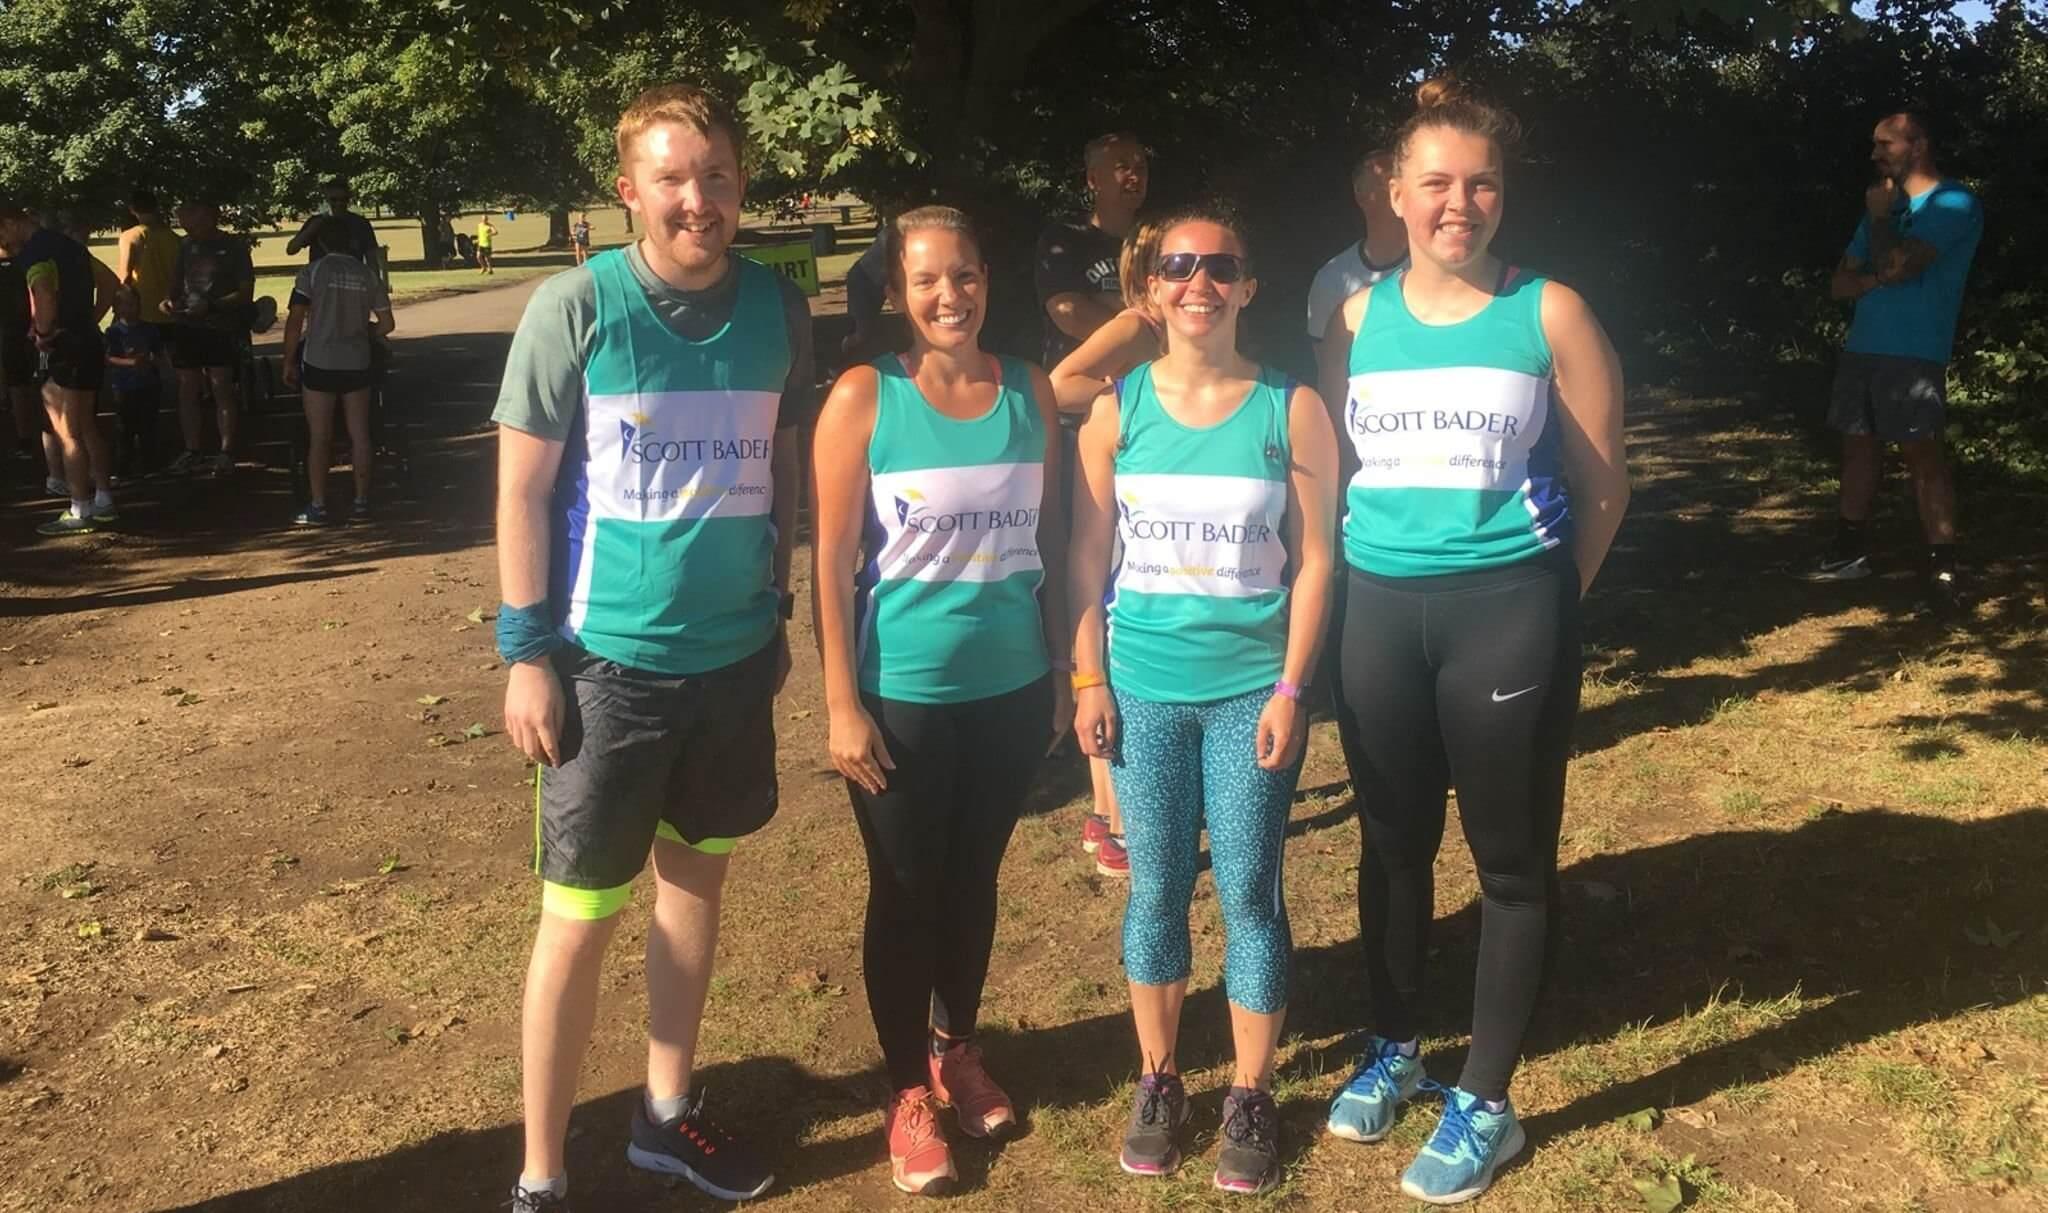 Scott Bader UK colleagues entering the Great Birmingham Run